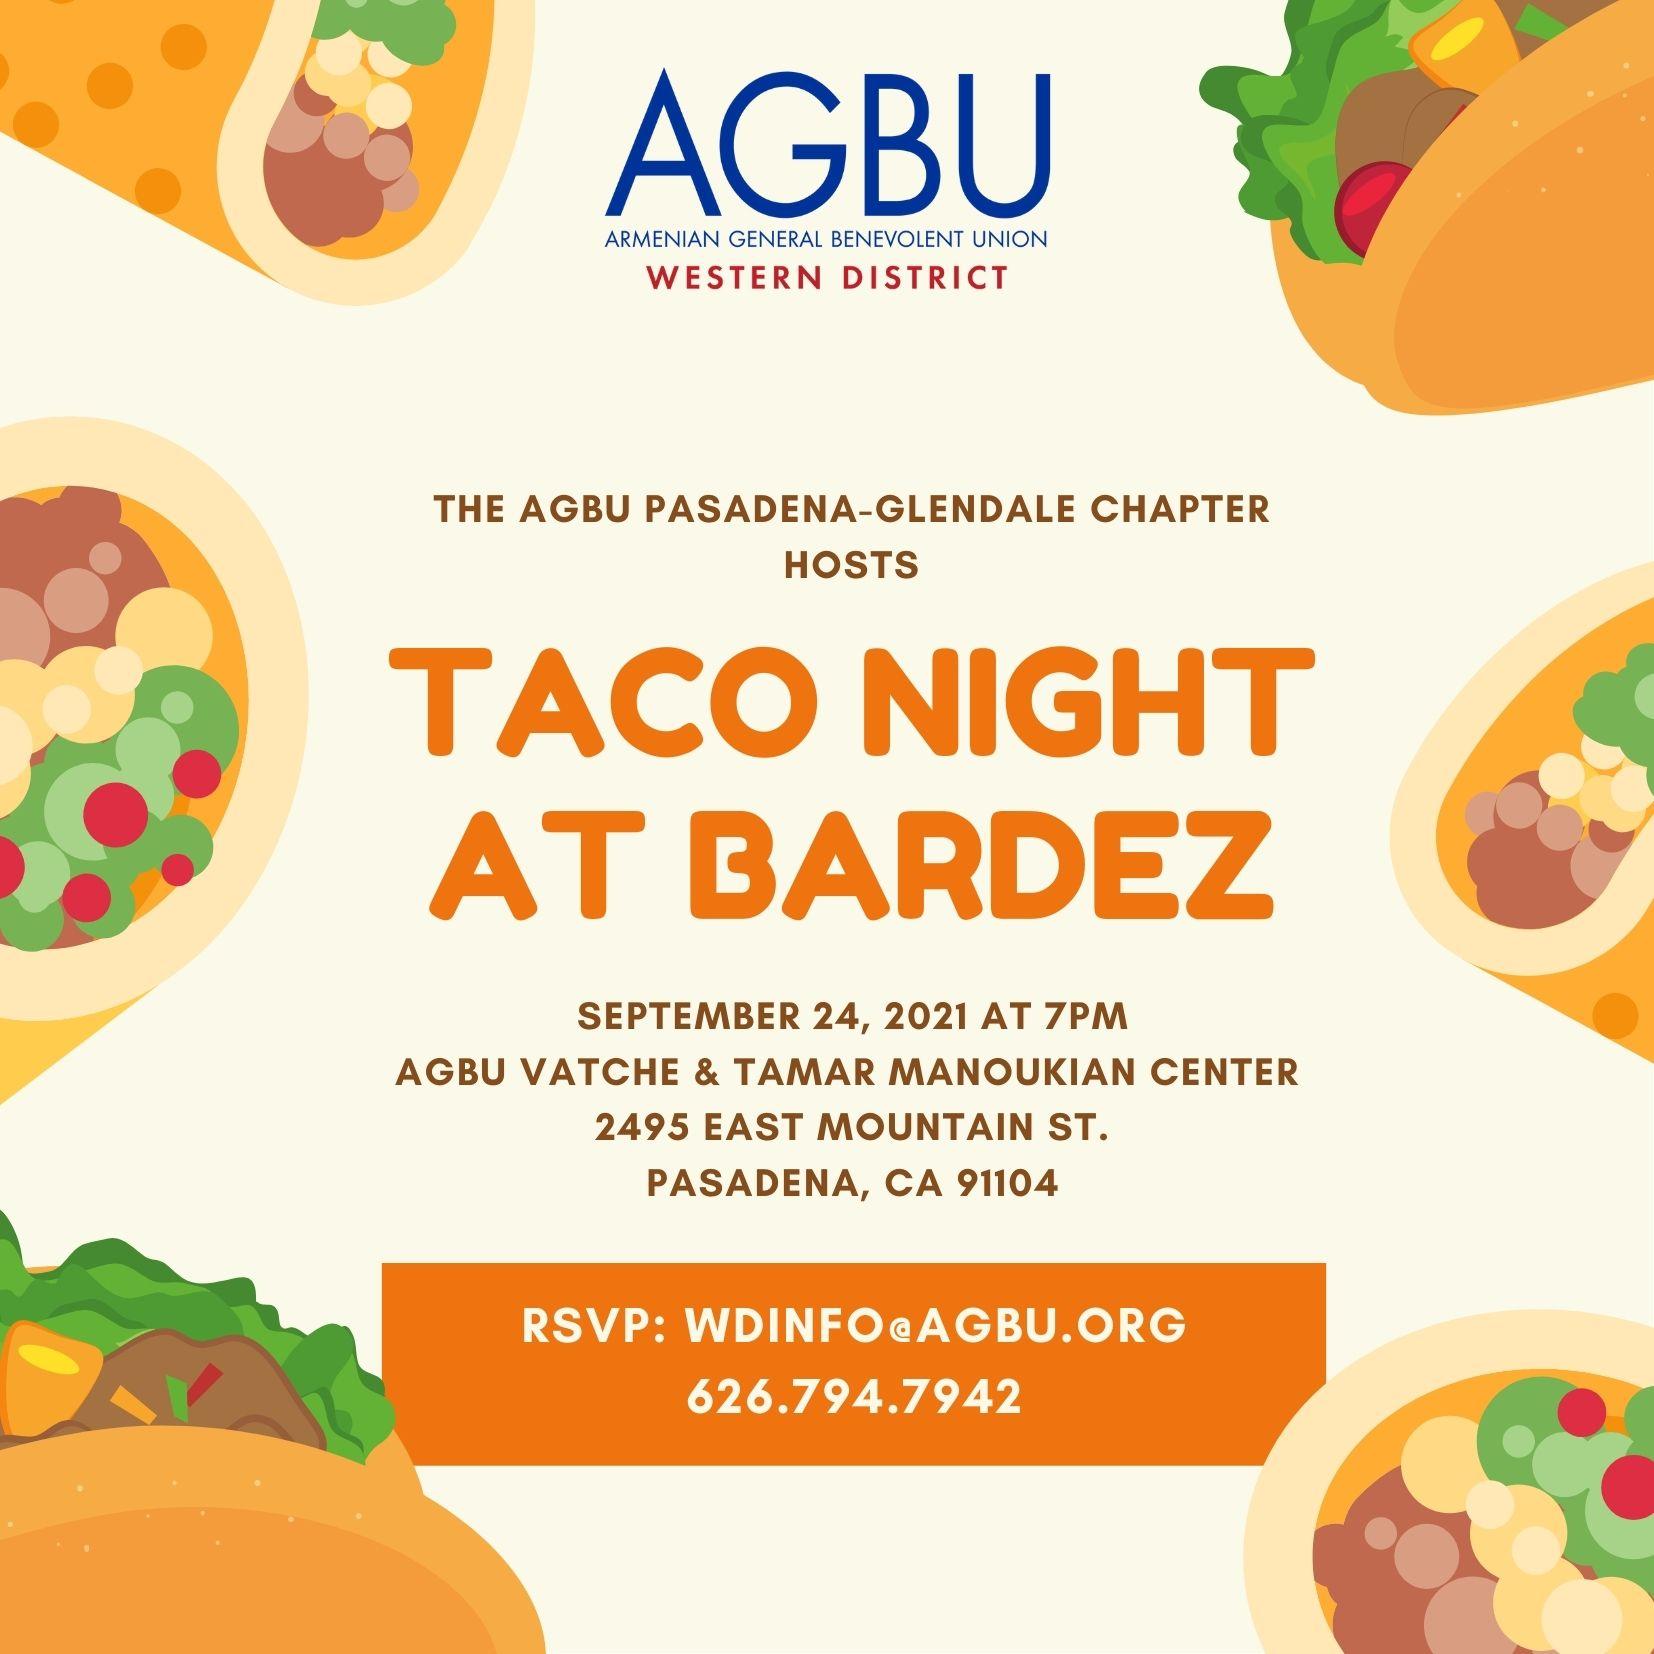 Taco Night at Bardez